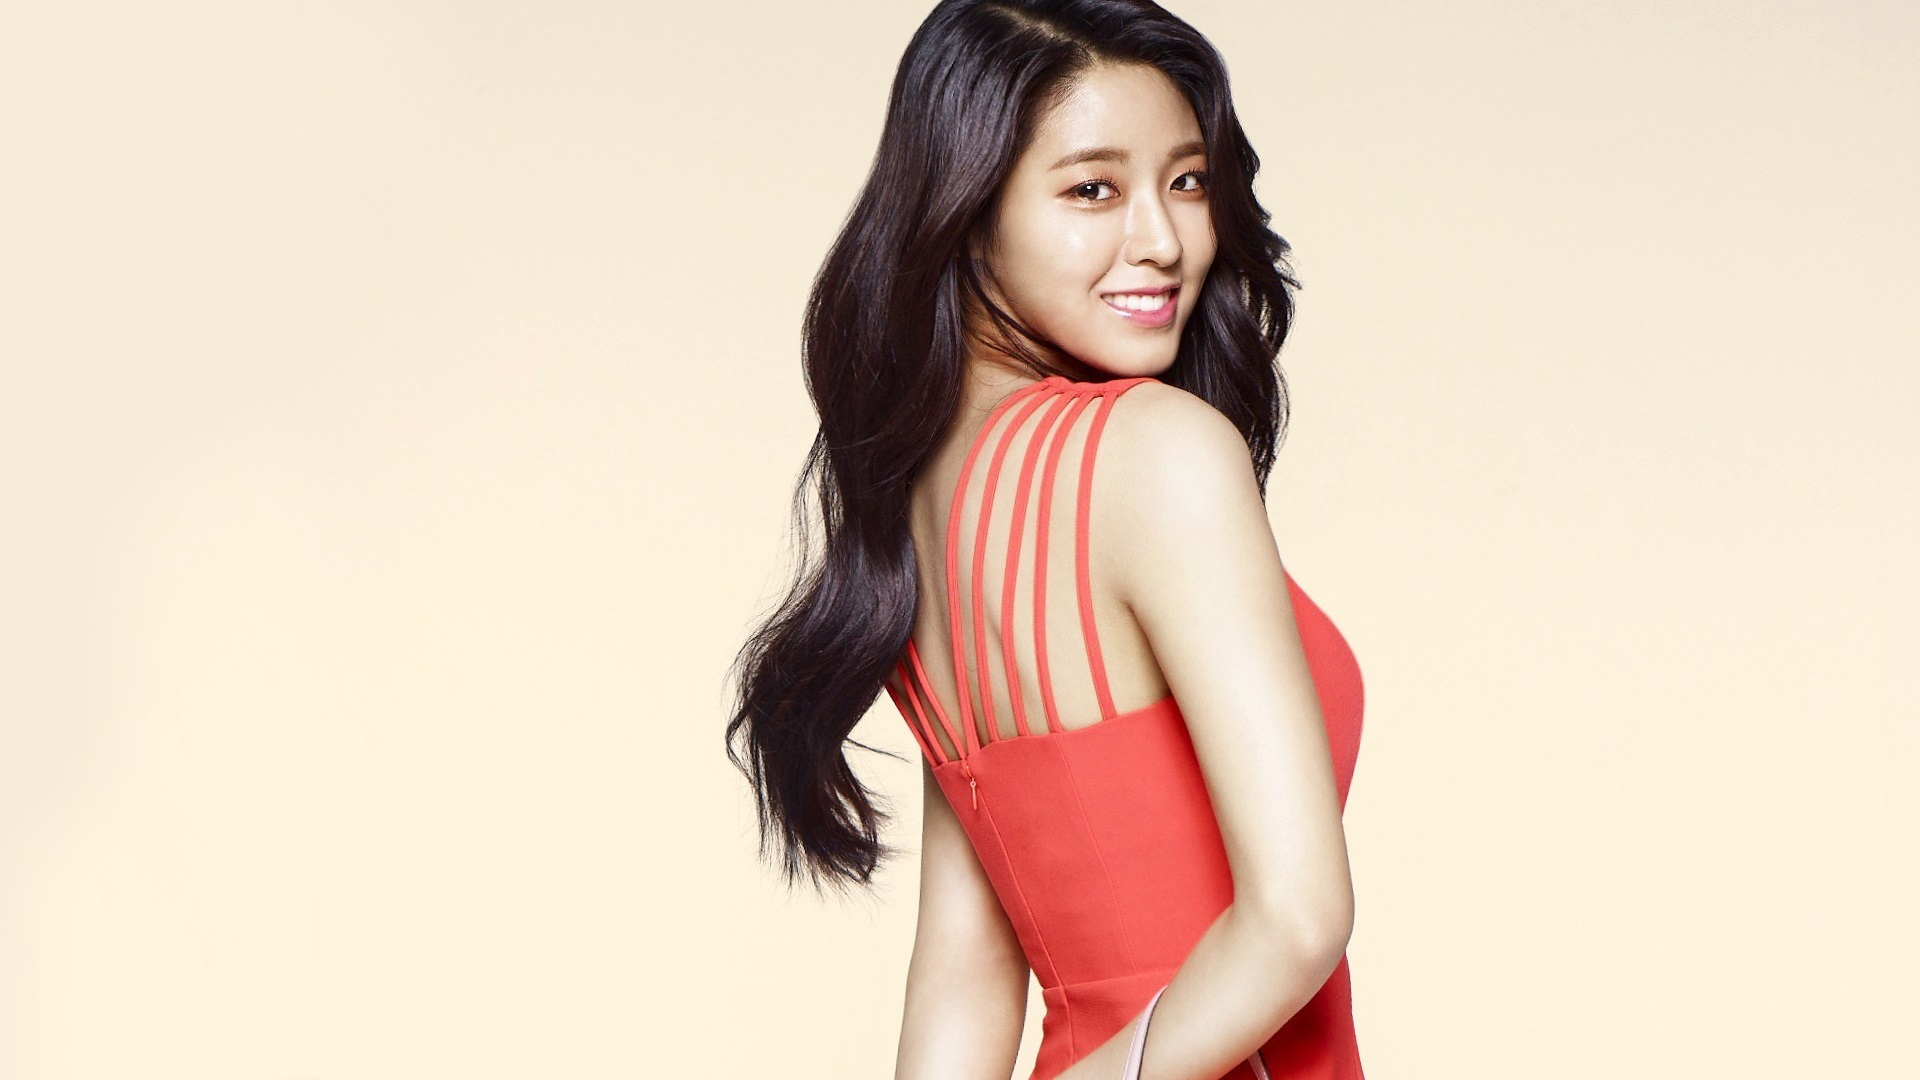 Wallpaper korean girls seolhyun 05 1920x1080 full hd picture image hd widescreen 169 resolutions 1366x7681600x9001920x1080 original voltagebd Image collections